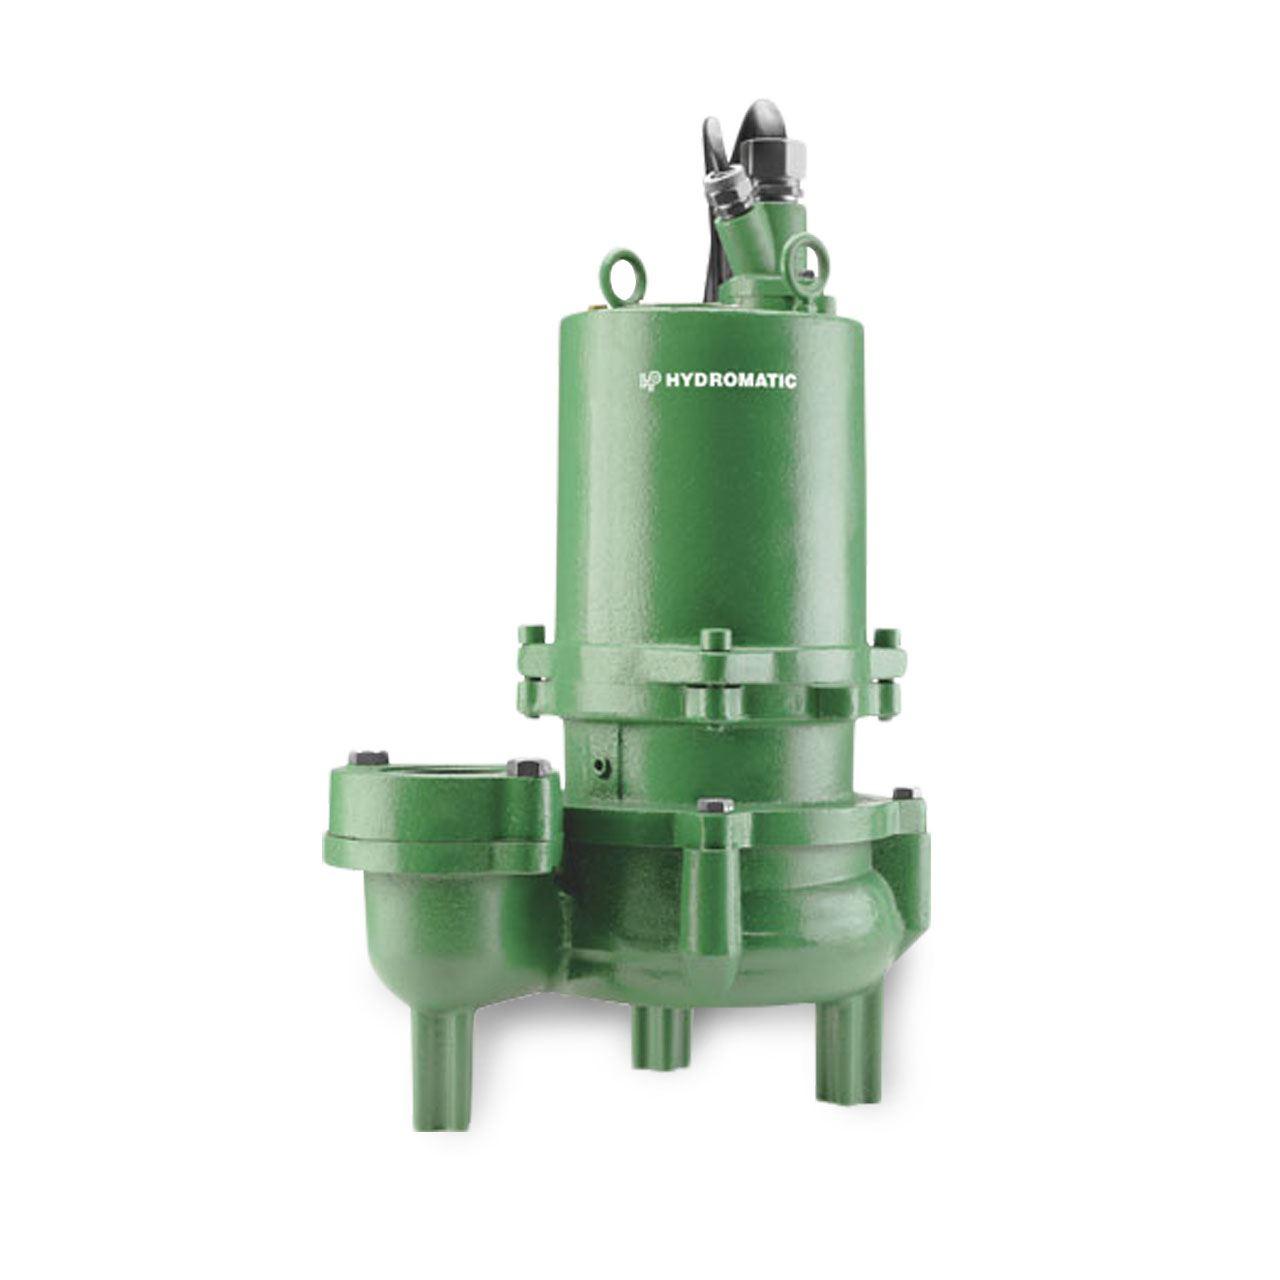 medium resolution of hydromatic pump wiring diagram wiring diagram third level myers pump wiring diagram hydromatic pump hydromatic sb4sd500m2